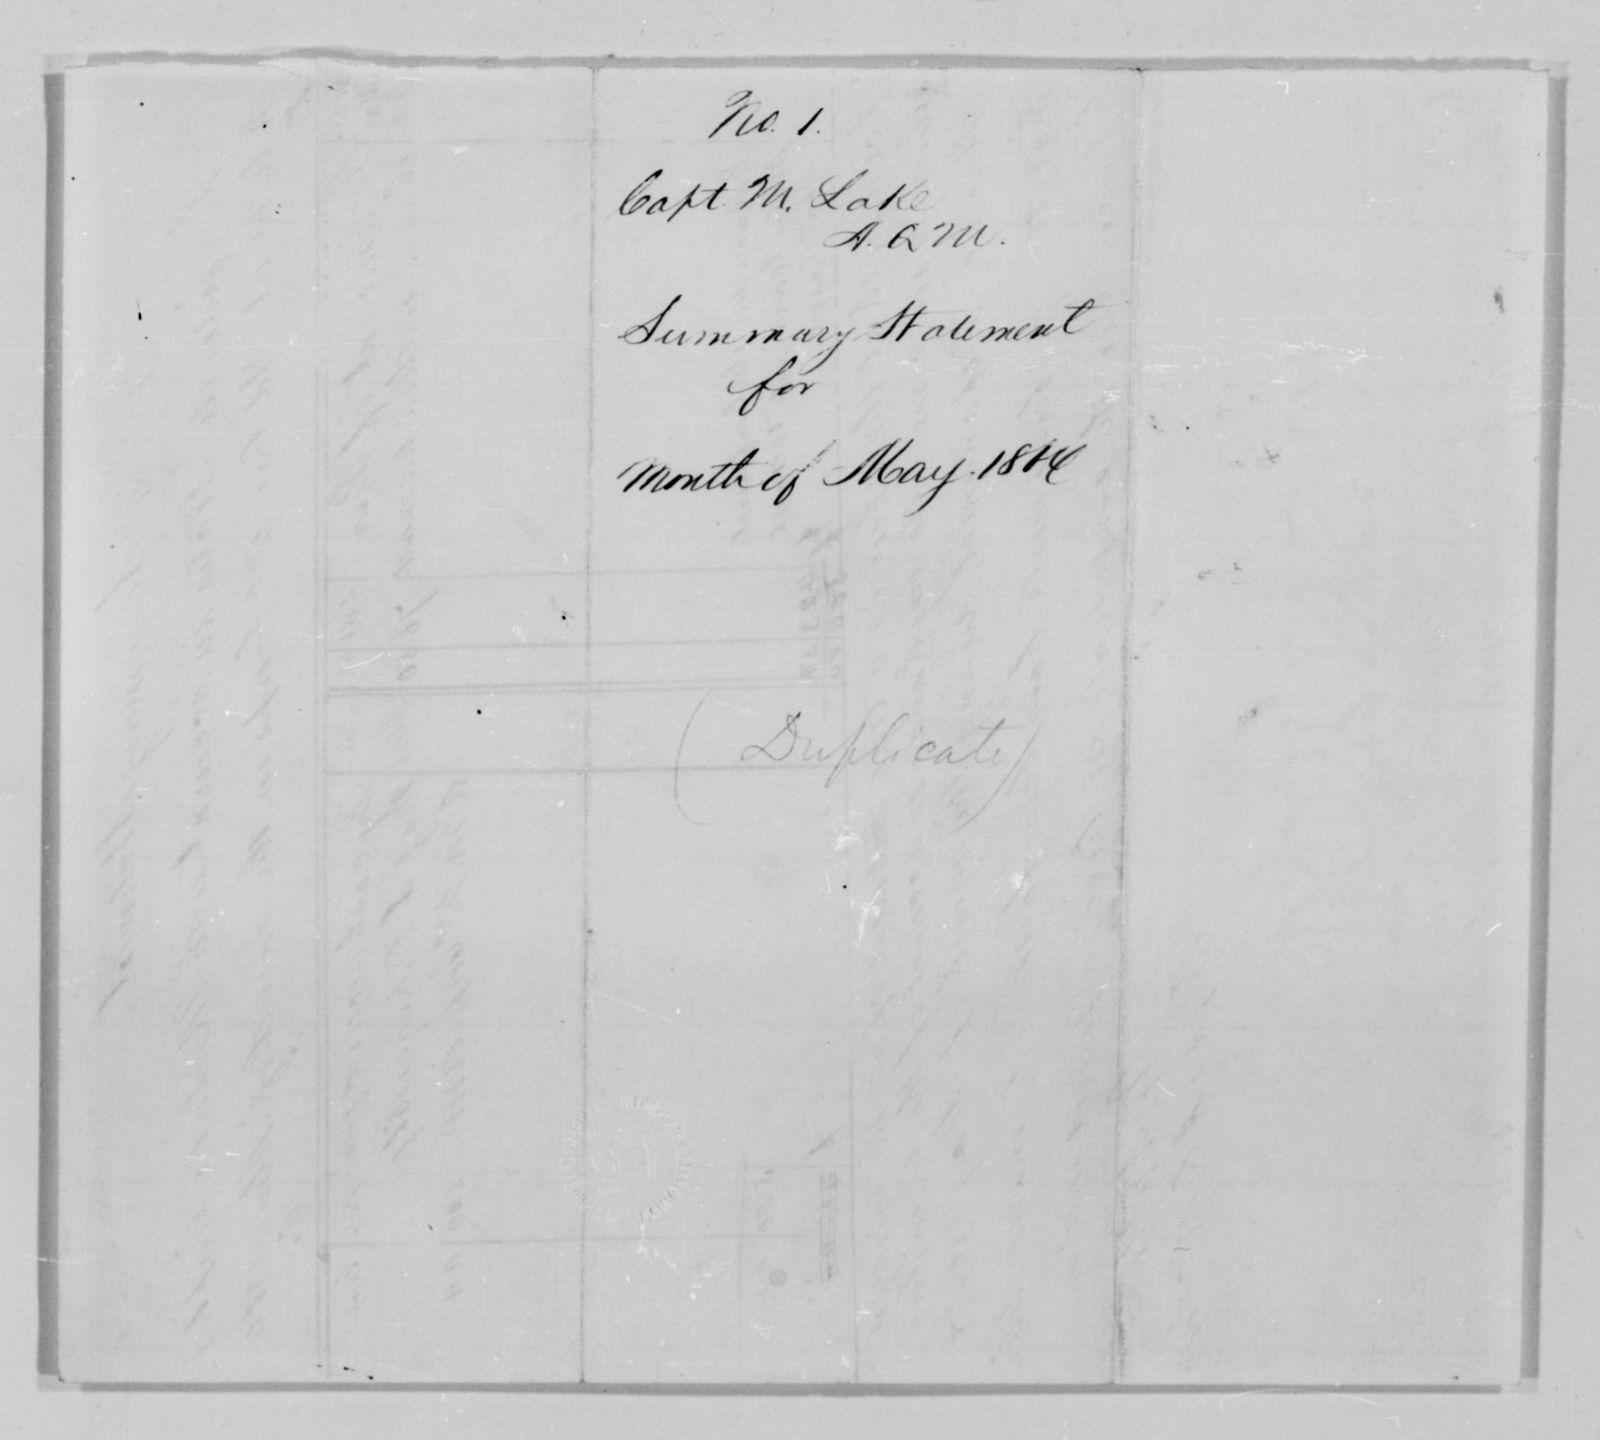 Confederate States of America records: Microfilm Reel 67